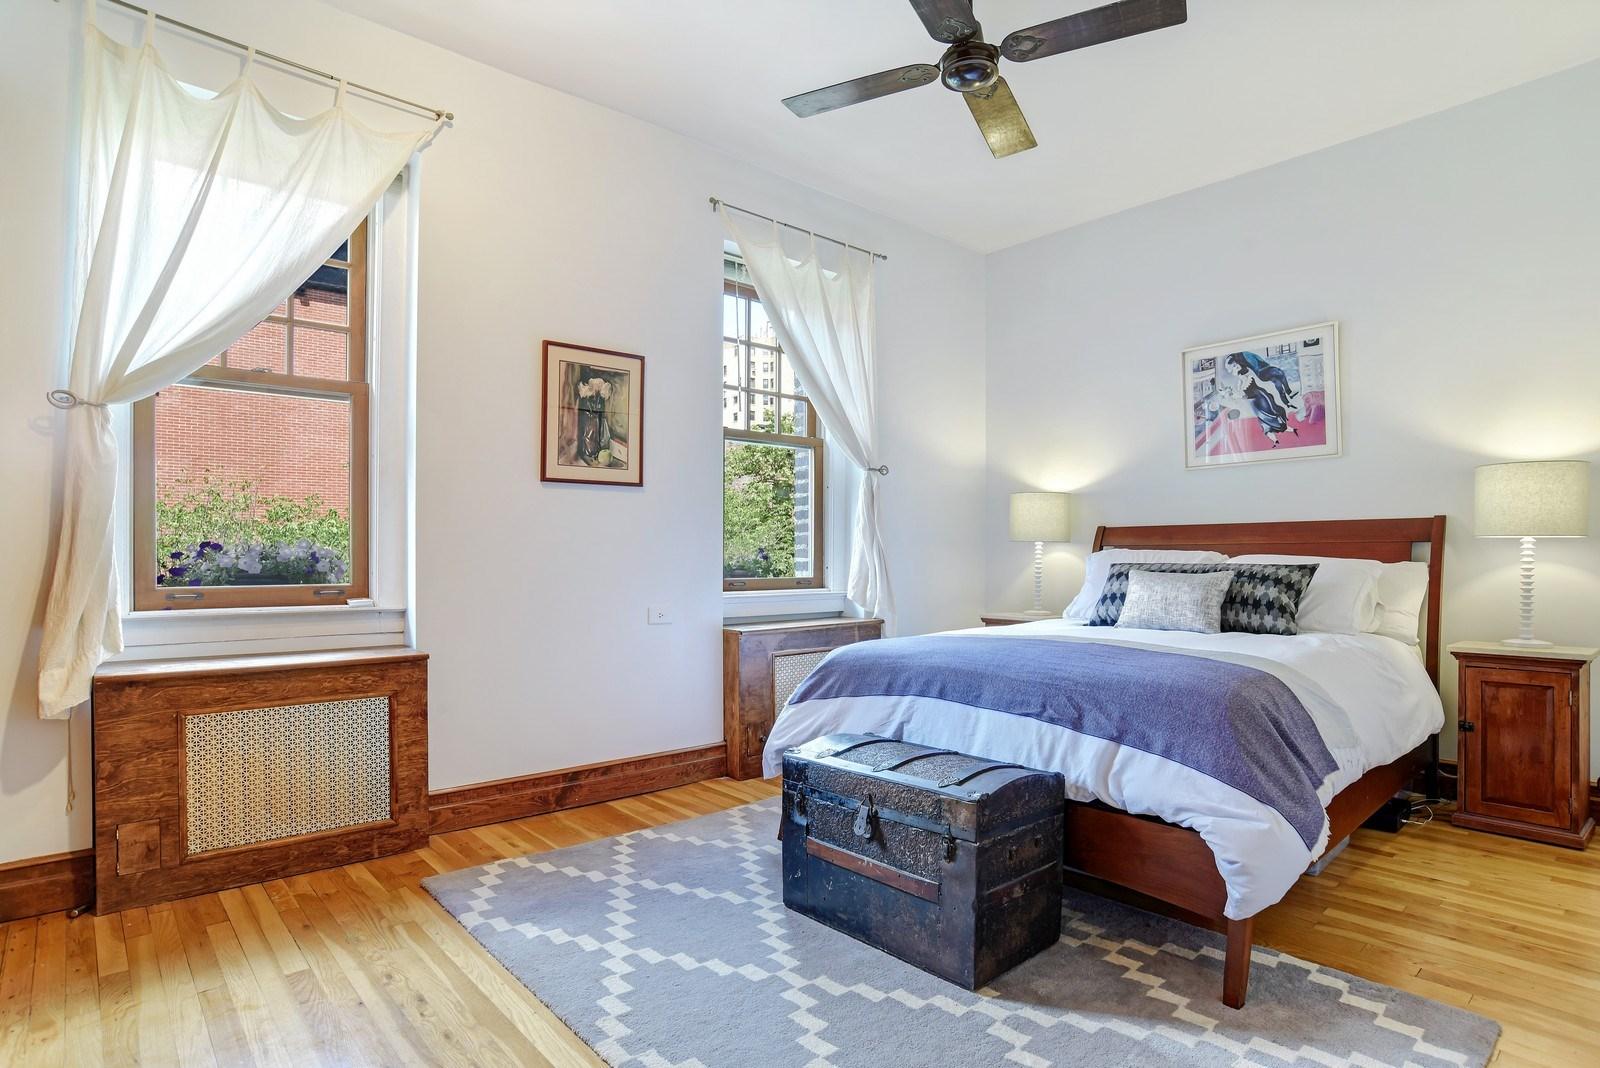 Blue apron park slope - Corcoran 101 8th Avenue Apt 9 Park Slope Real Estate Brooklyn For Sale Homes Park Slope Co Op Jessica Buchman Tim Rettaliata